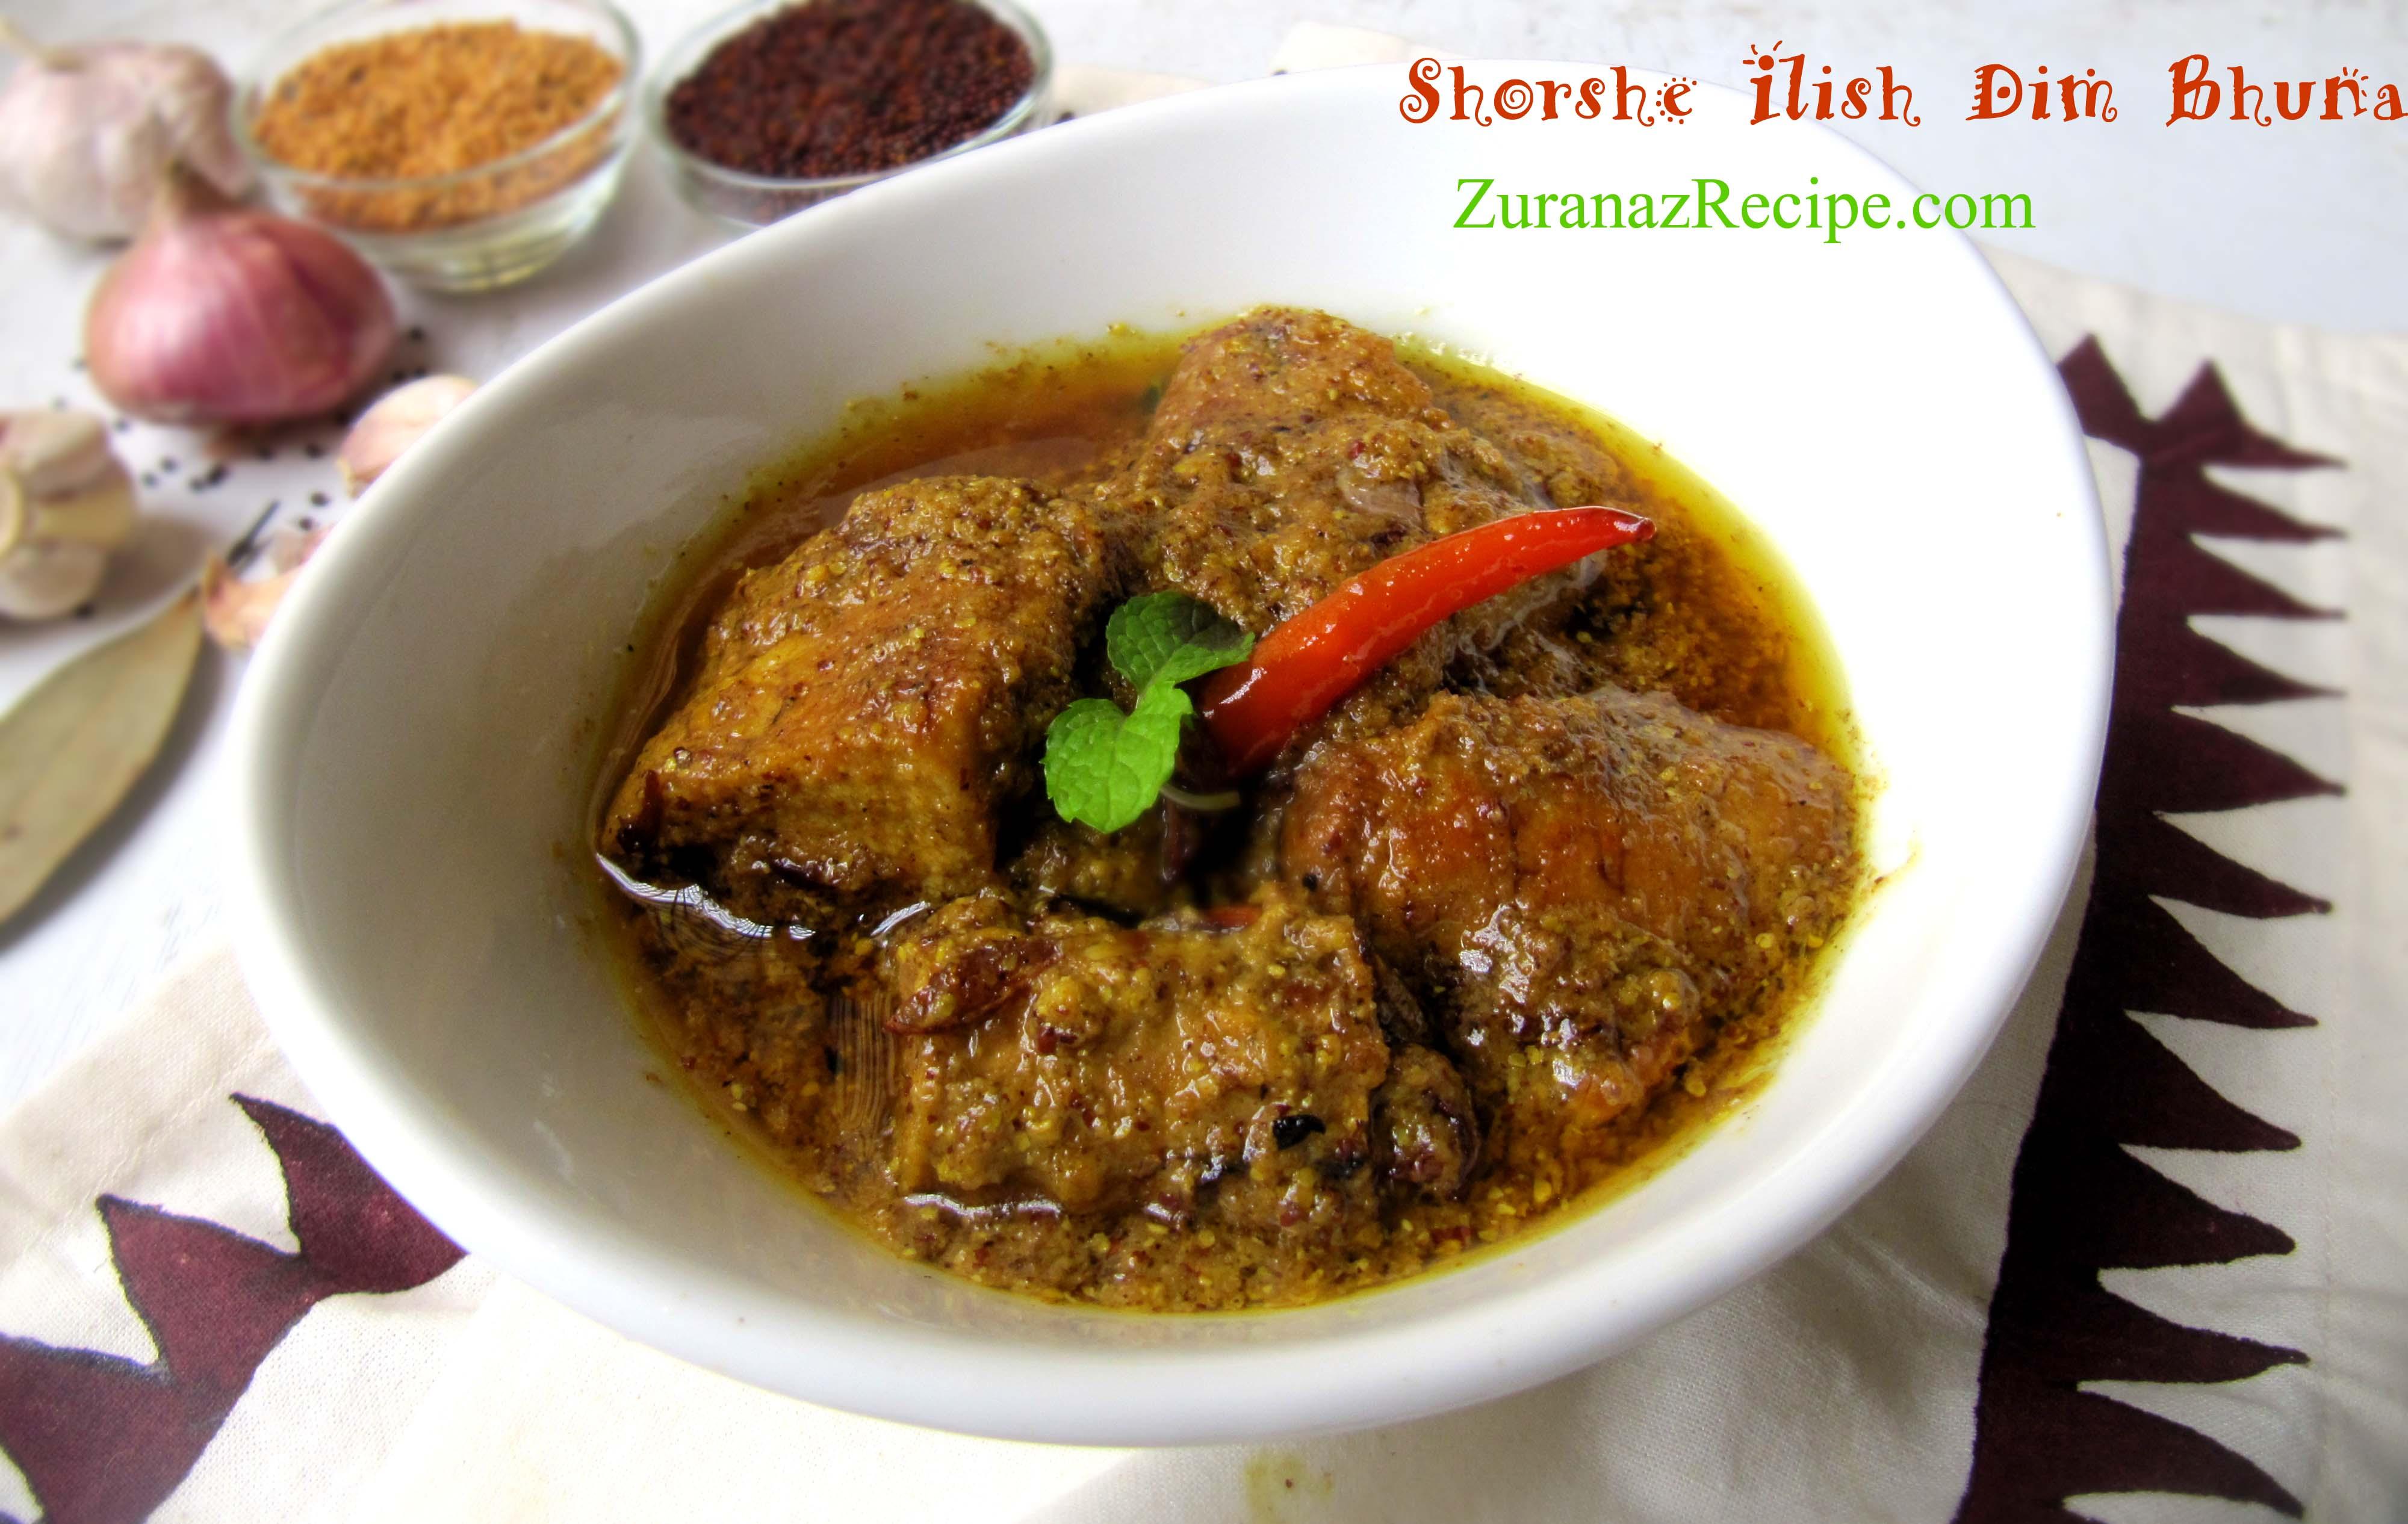 Shorshe Diye Ilish Dim Bhuna